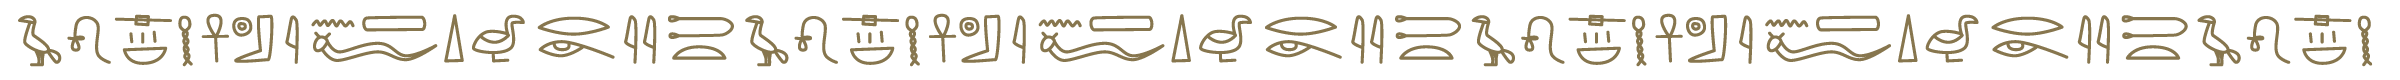 Egyptian Symbols1 Home